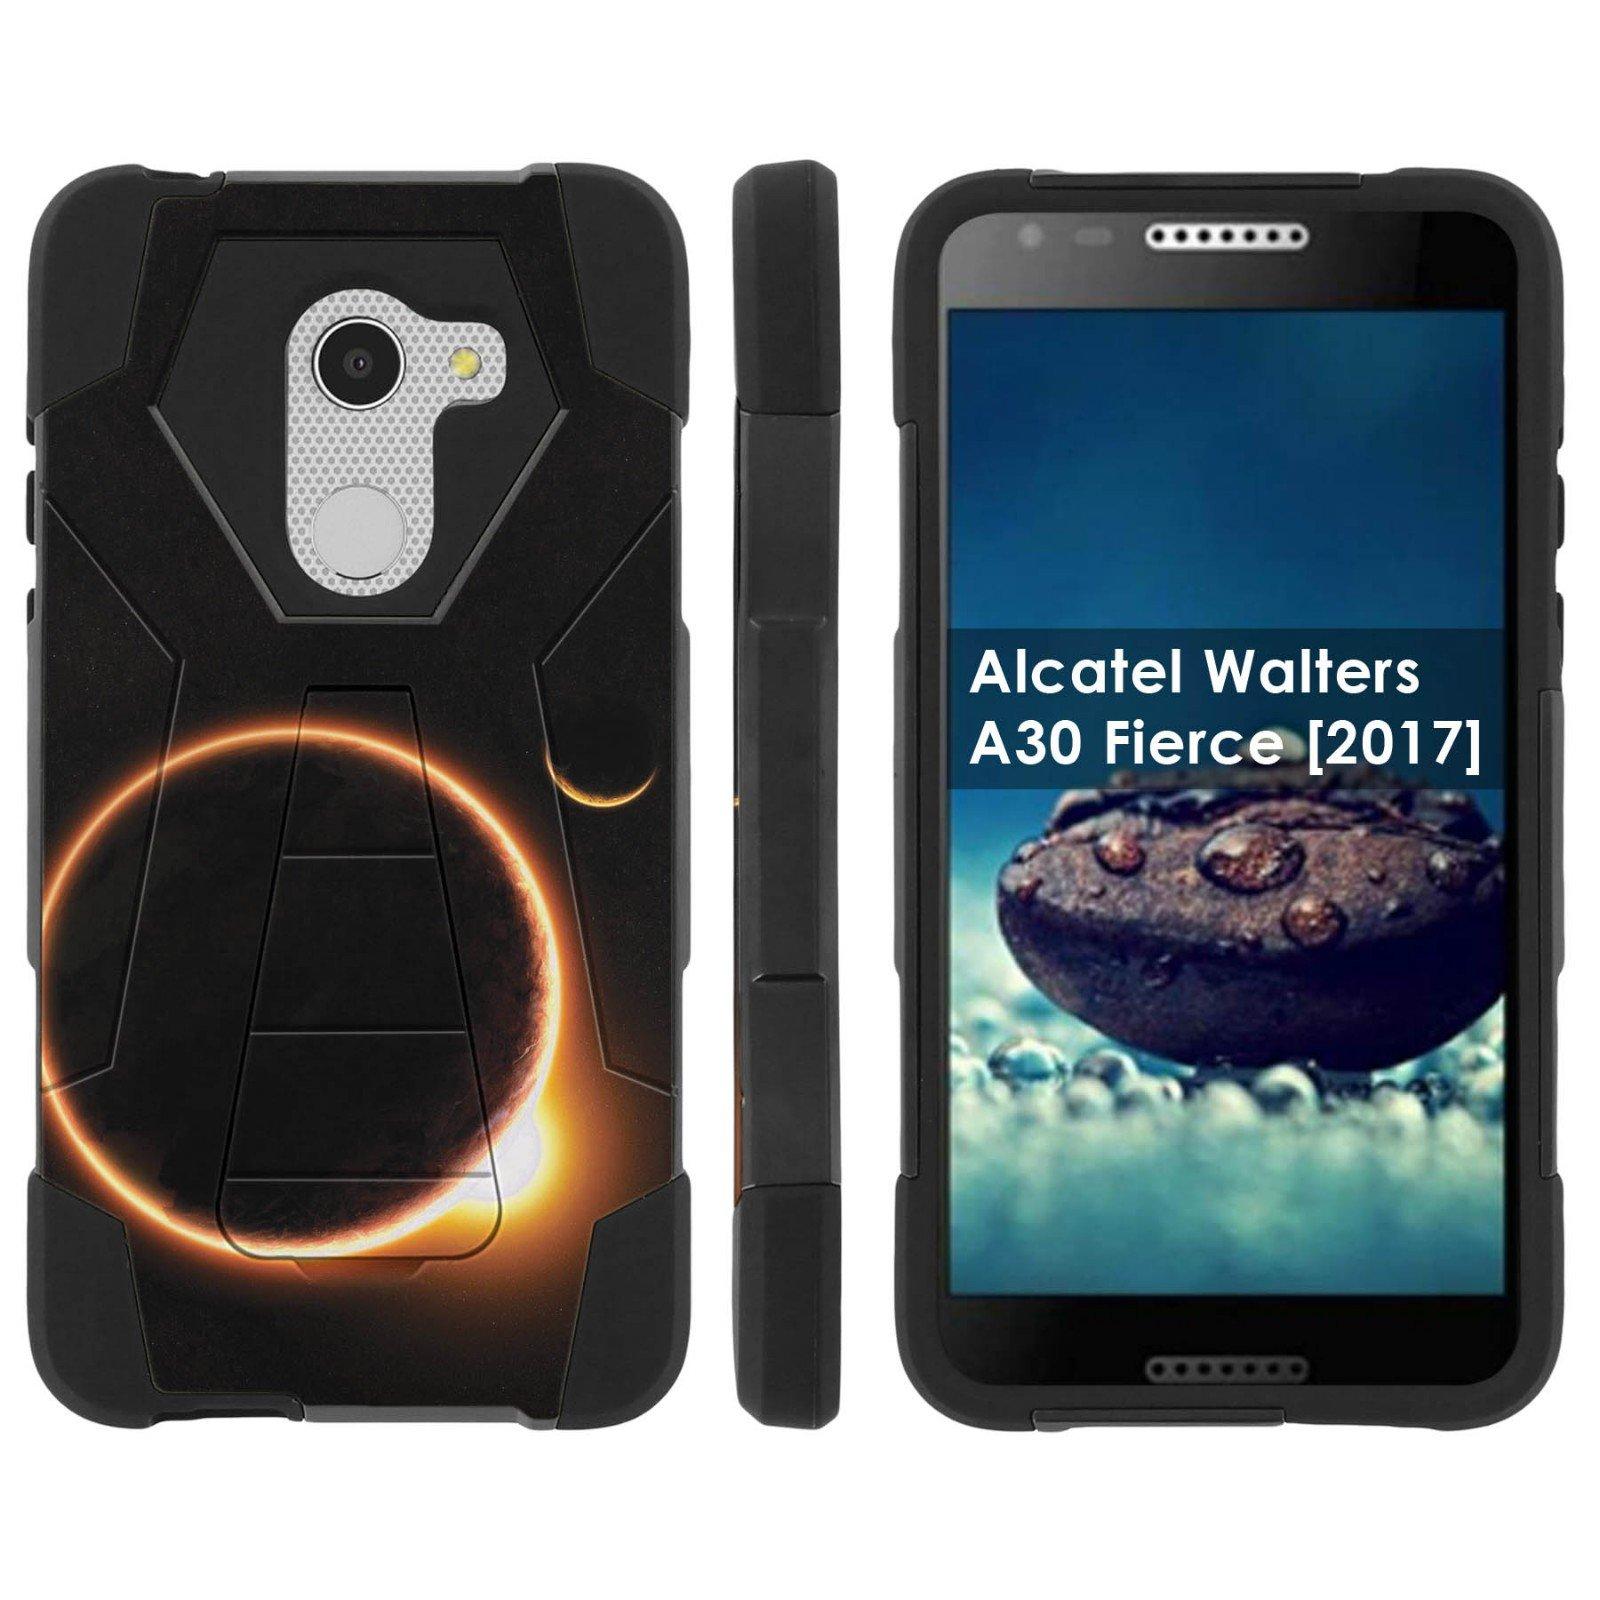 [Mobiflare] Dual Layer Armor Case [Kickstand] for Alcatel REVVL /Alcatel Walters / Alcatel A30 Fierce [2017] [Black/Black] Mil-Spec - [Solar Eclipse]